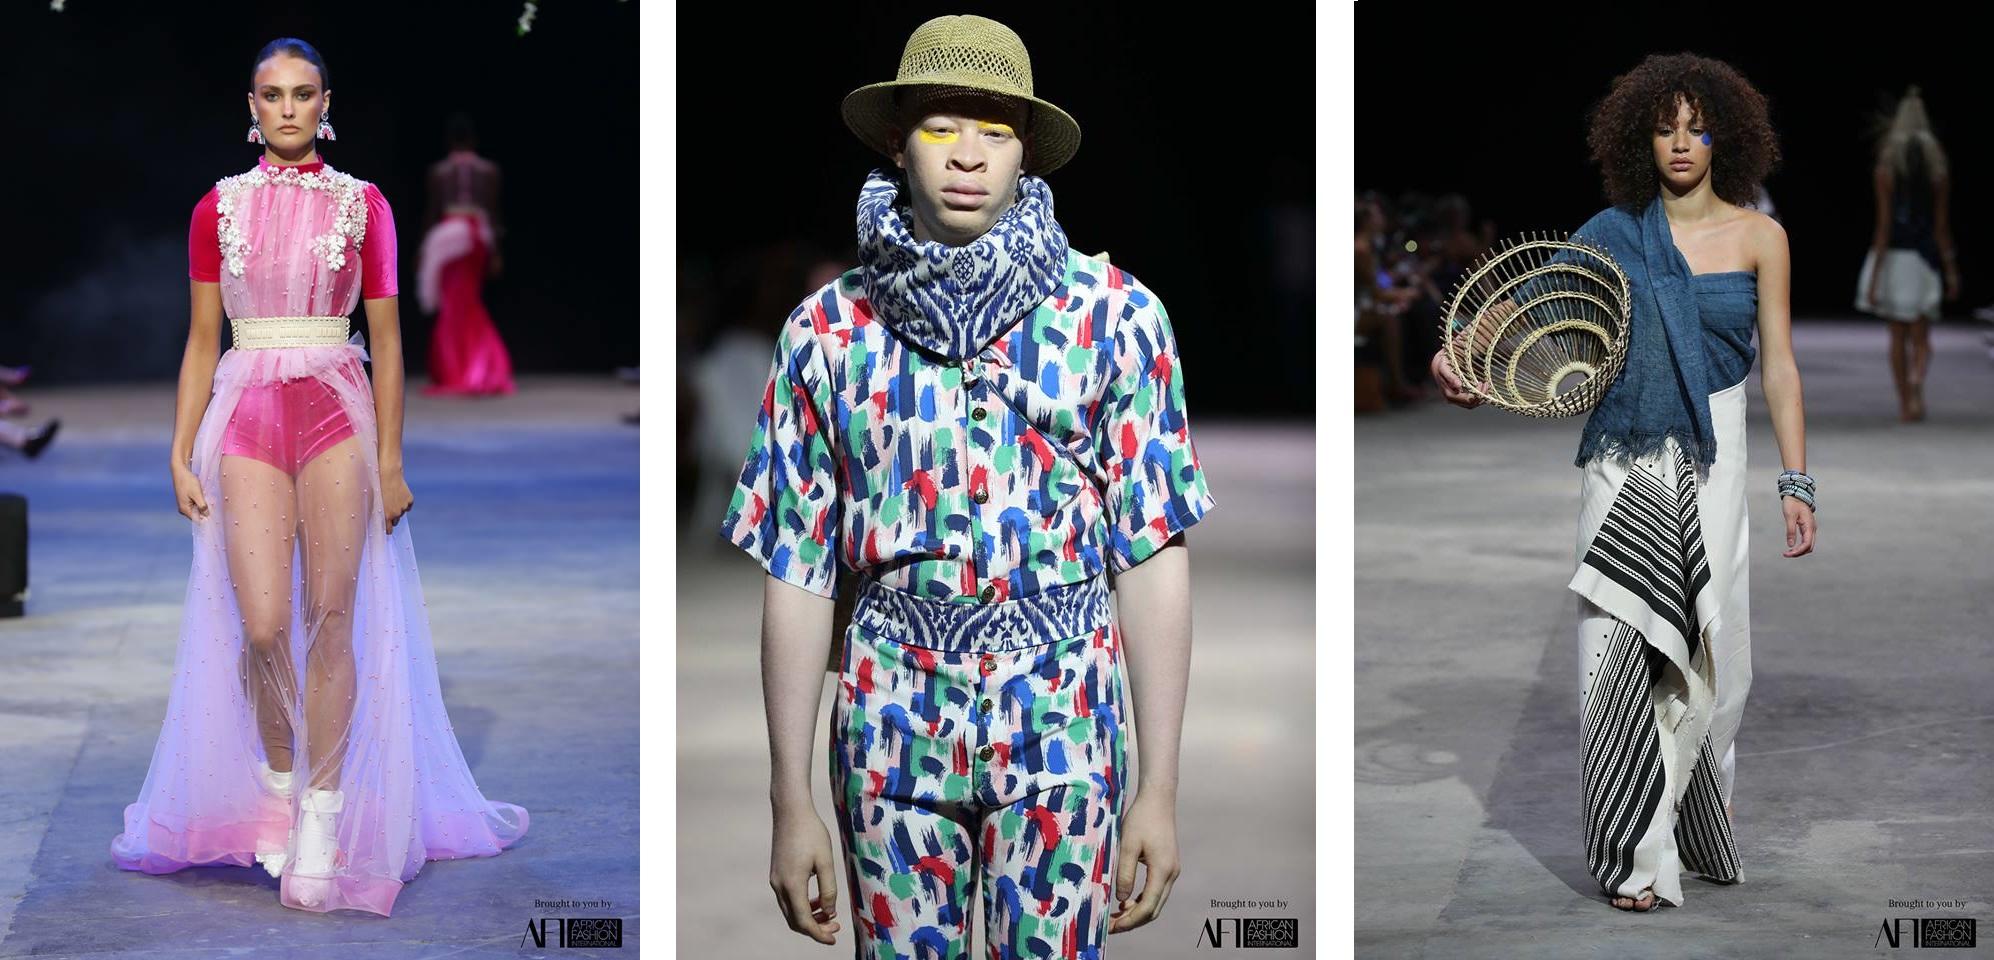 AFI Fashion Week